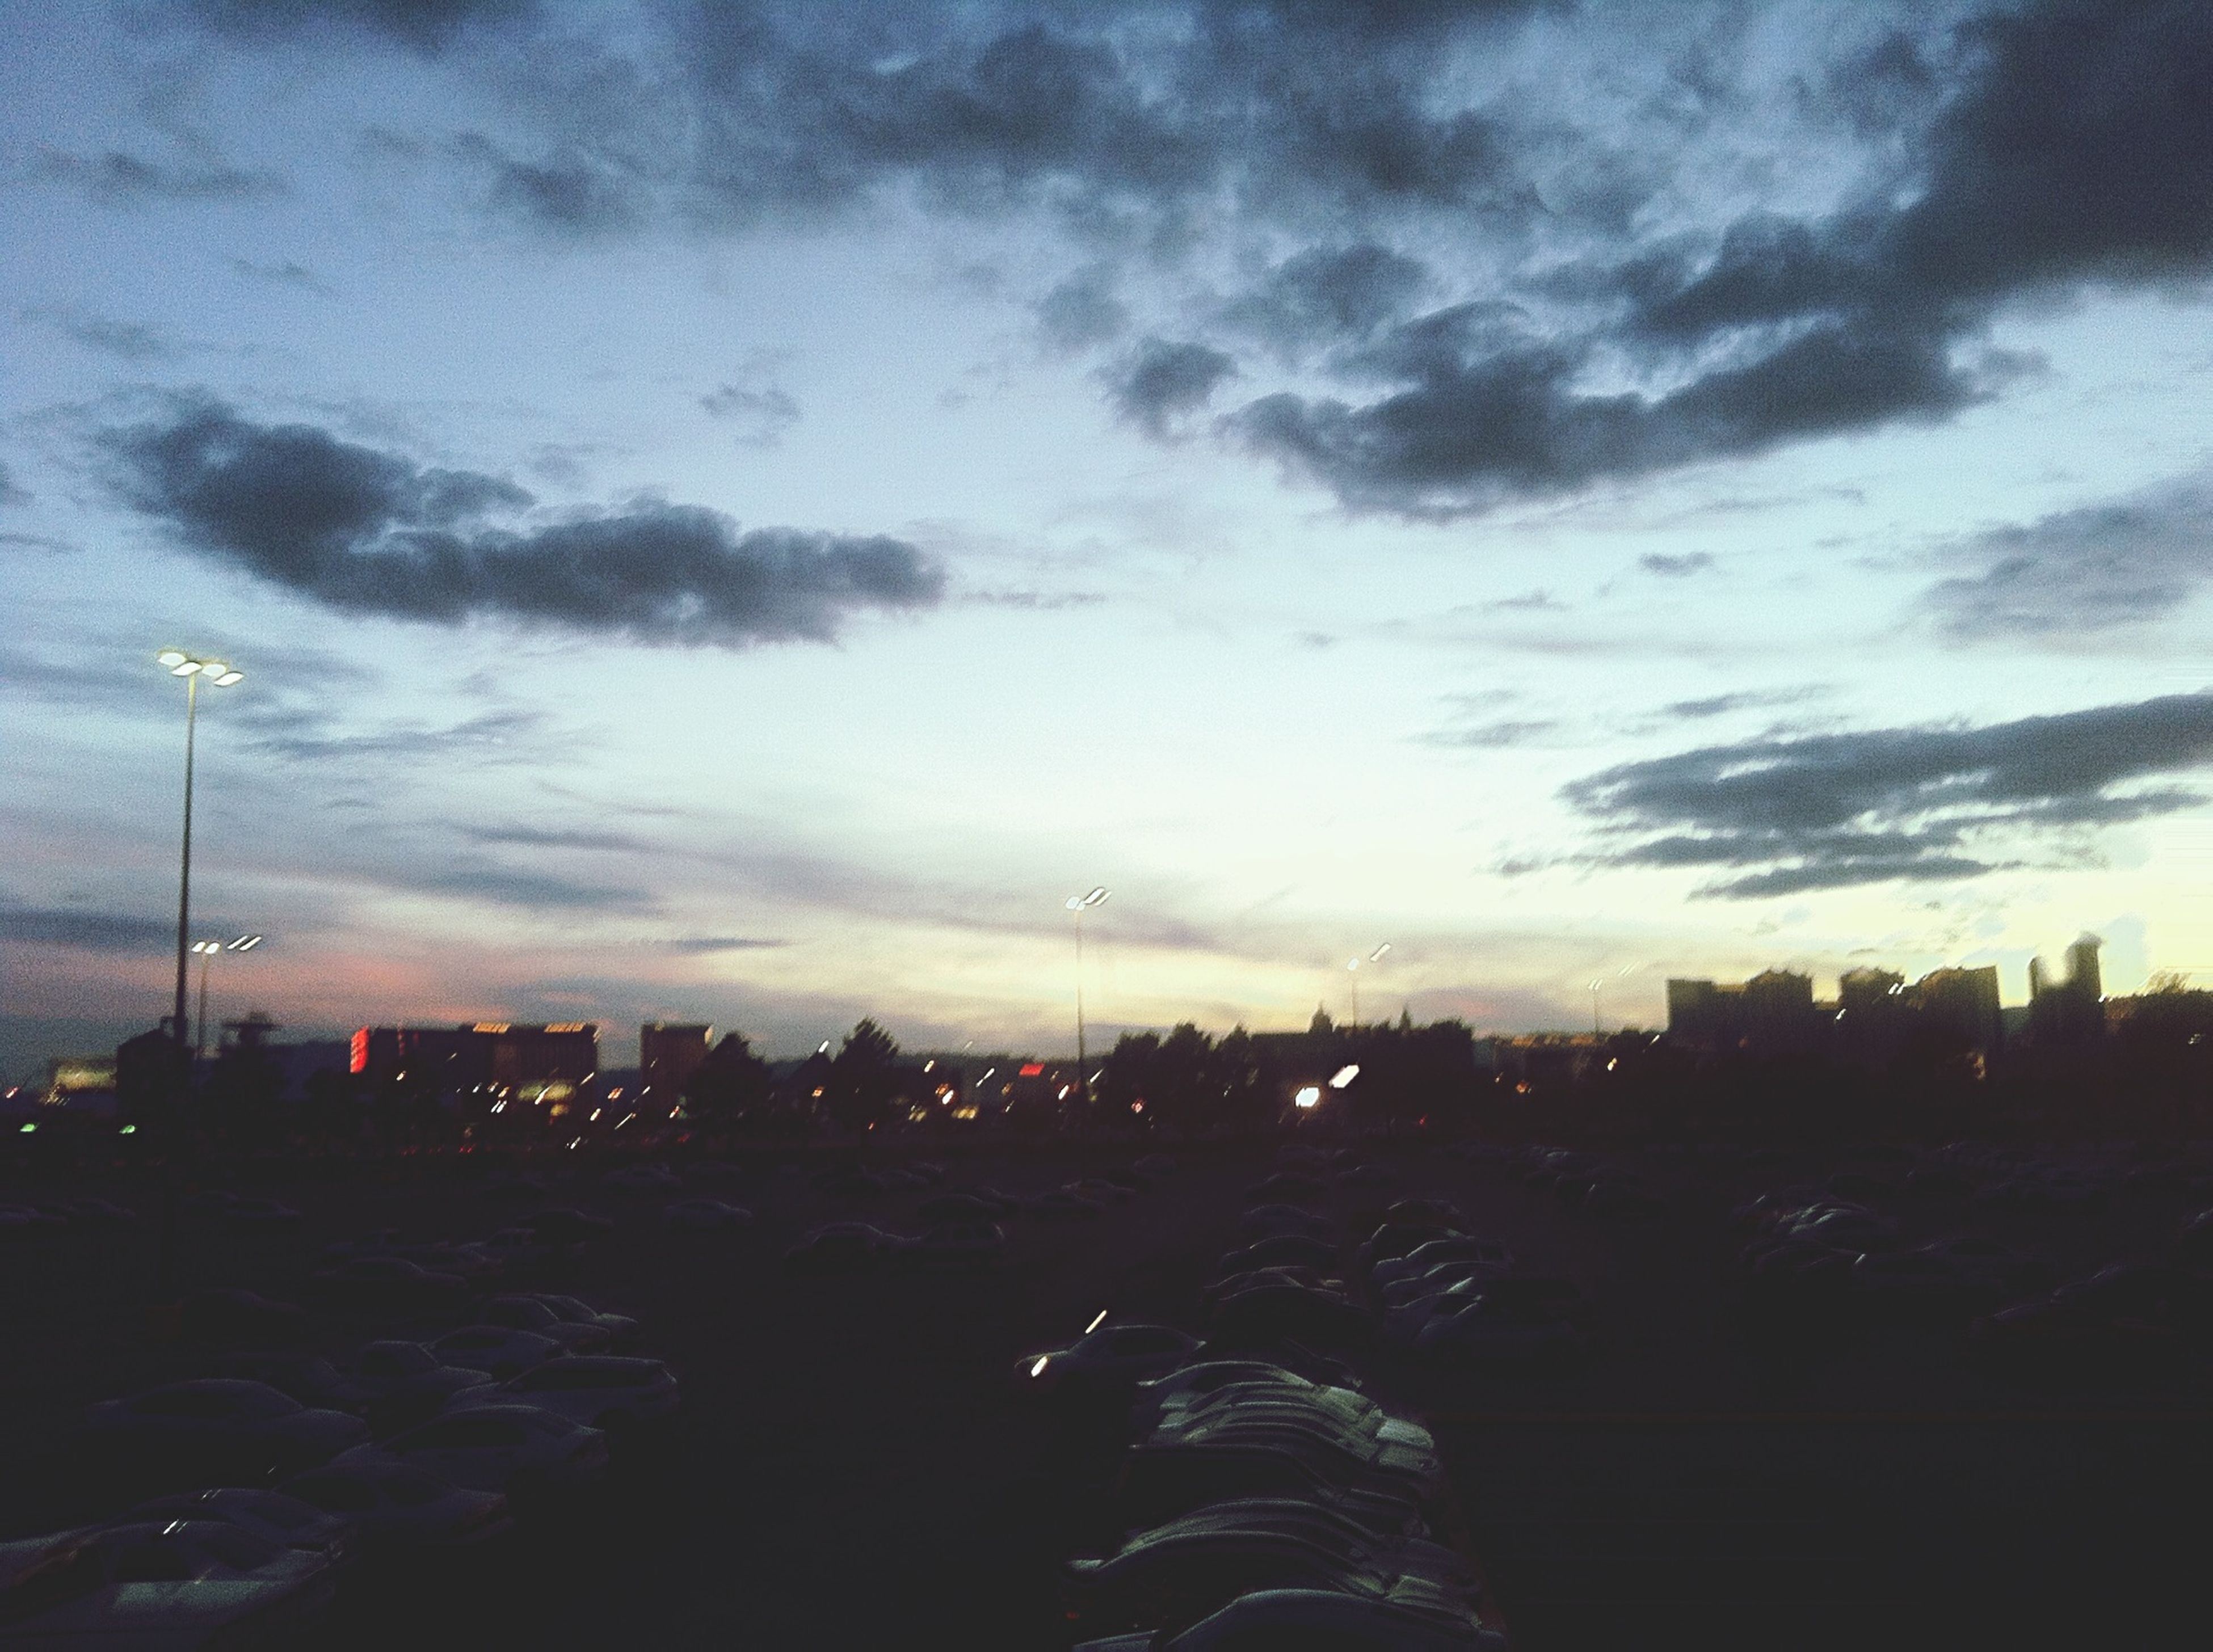 sky, building exterior, cloud - sky, silhouette, sunset, built structure, city, architecture, cityscape, cloudy, dusk, cloud, outdoors, residential district, nature, dark, residential building, dramatic sky, landscape, residential structure